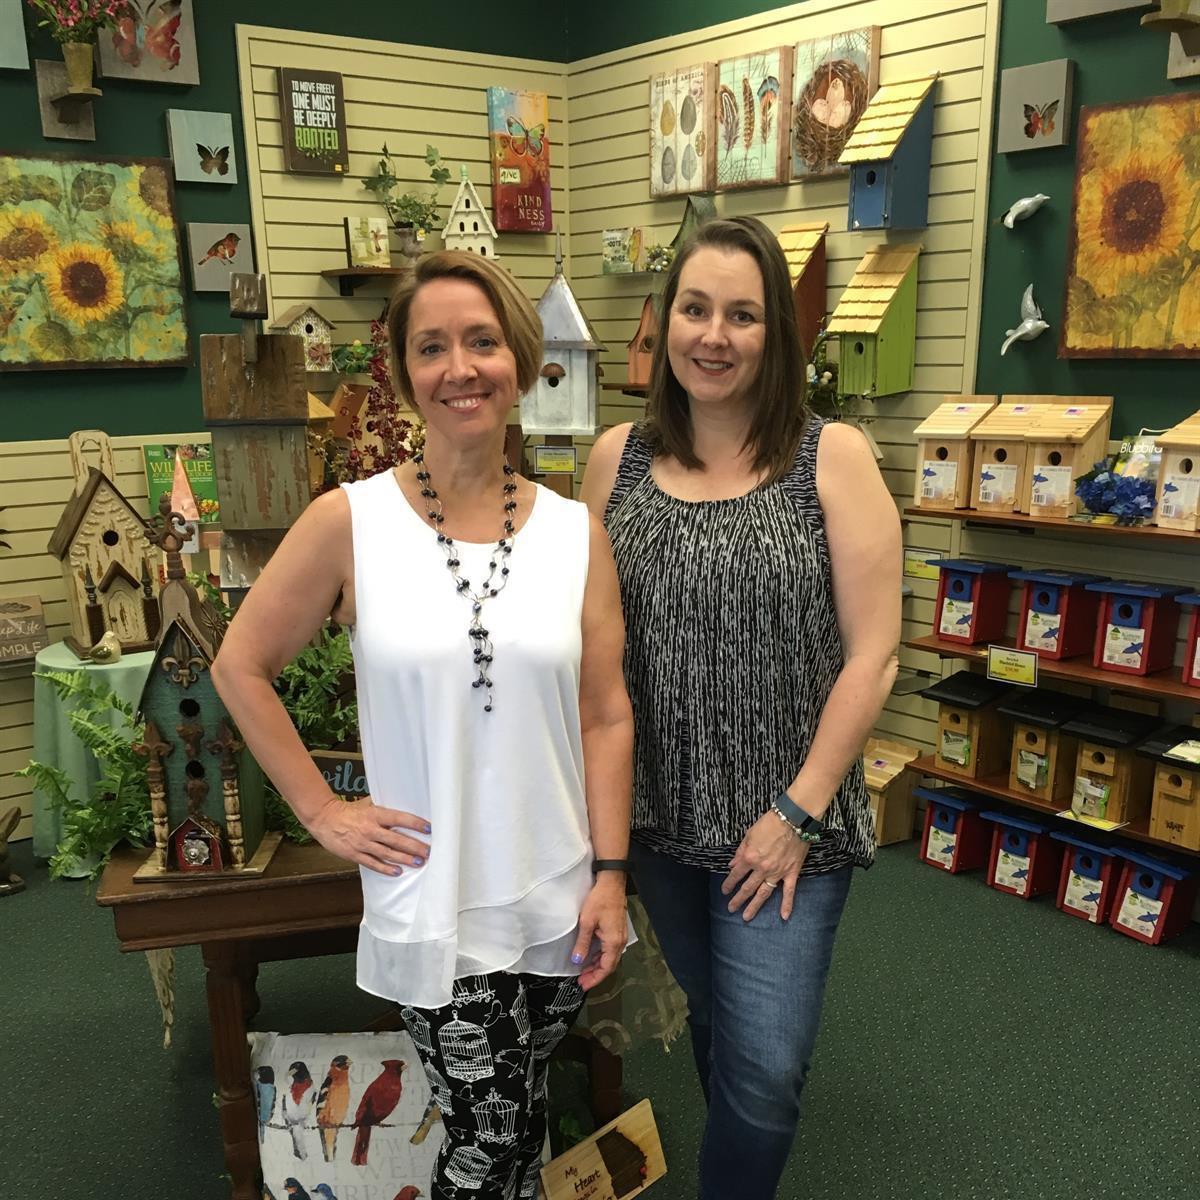 Julia Elliott and Karen Theodorou, owners of Bird Watcher Supply Company